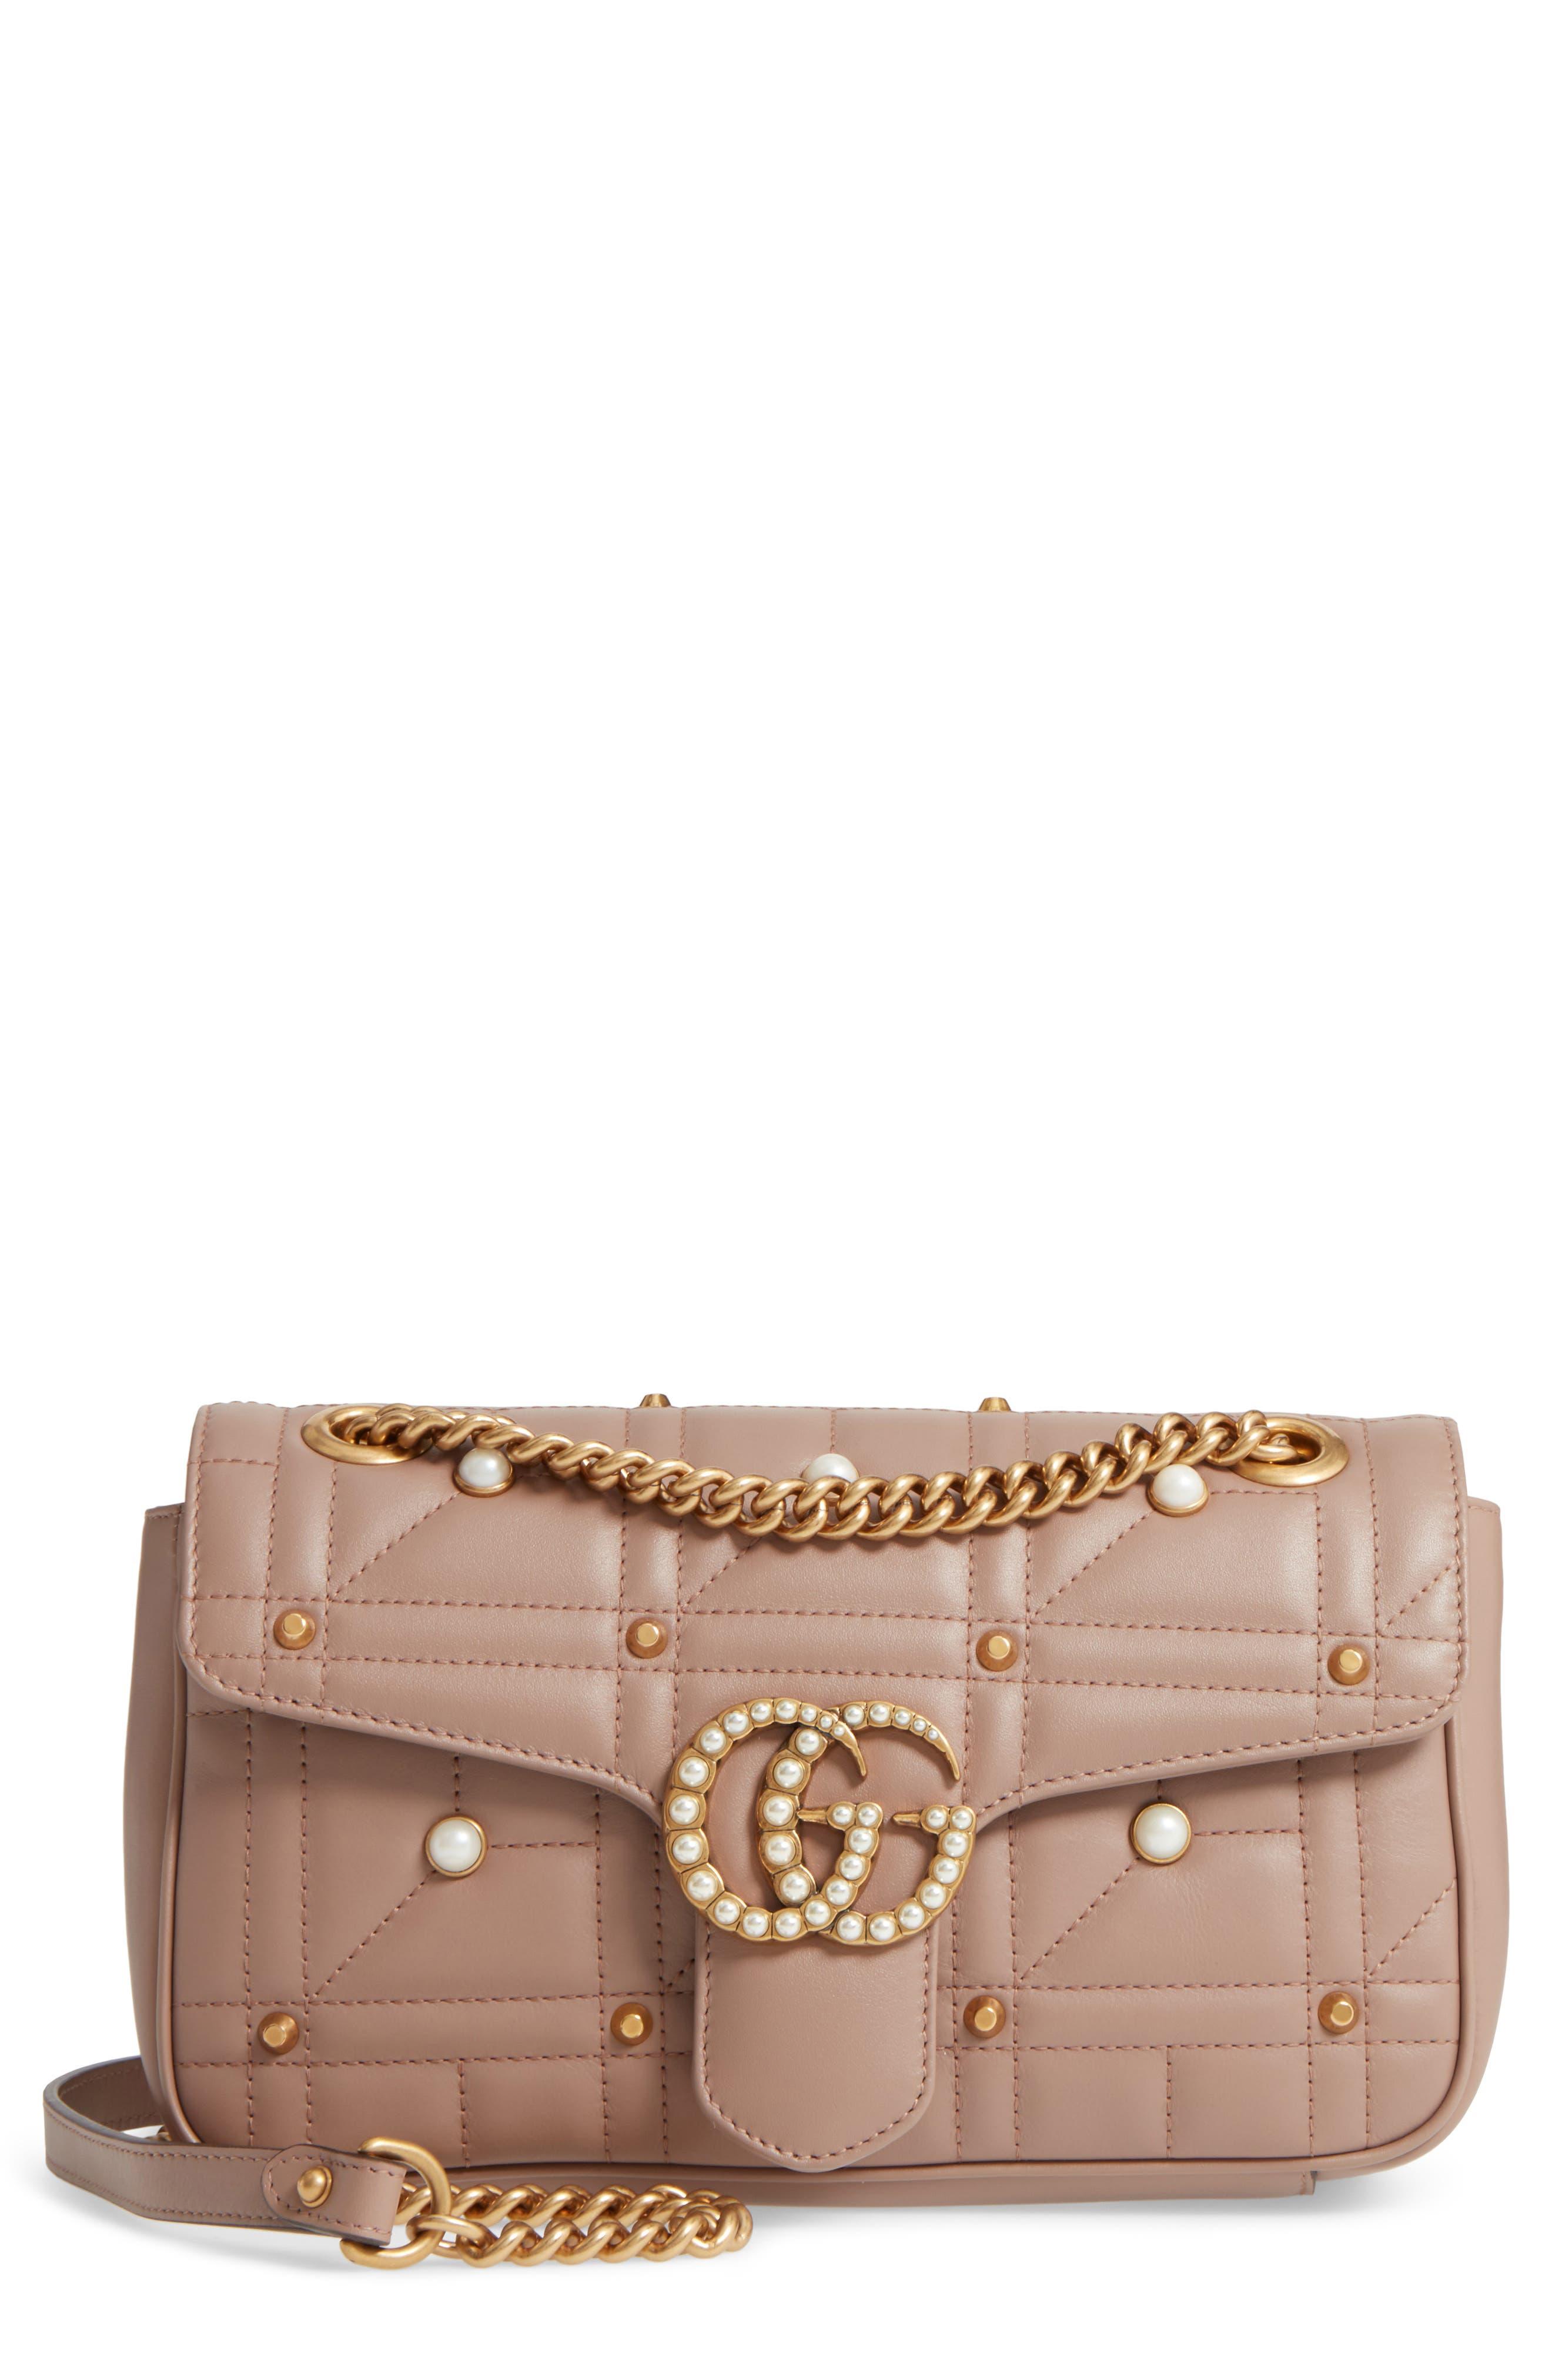 GG Marmont Matelassé Imitation Pearl Leather Shoulder Bag,                         Main,                         color, White/ Pink